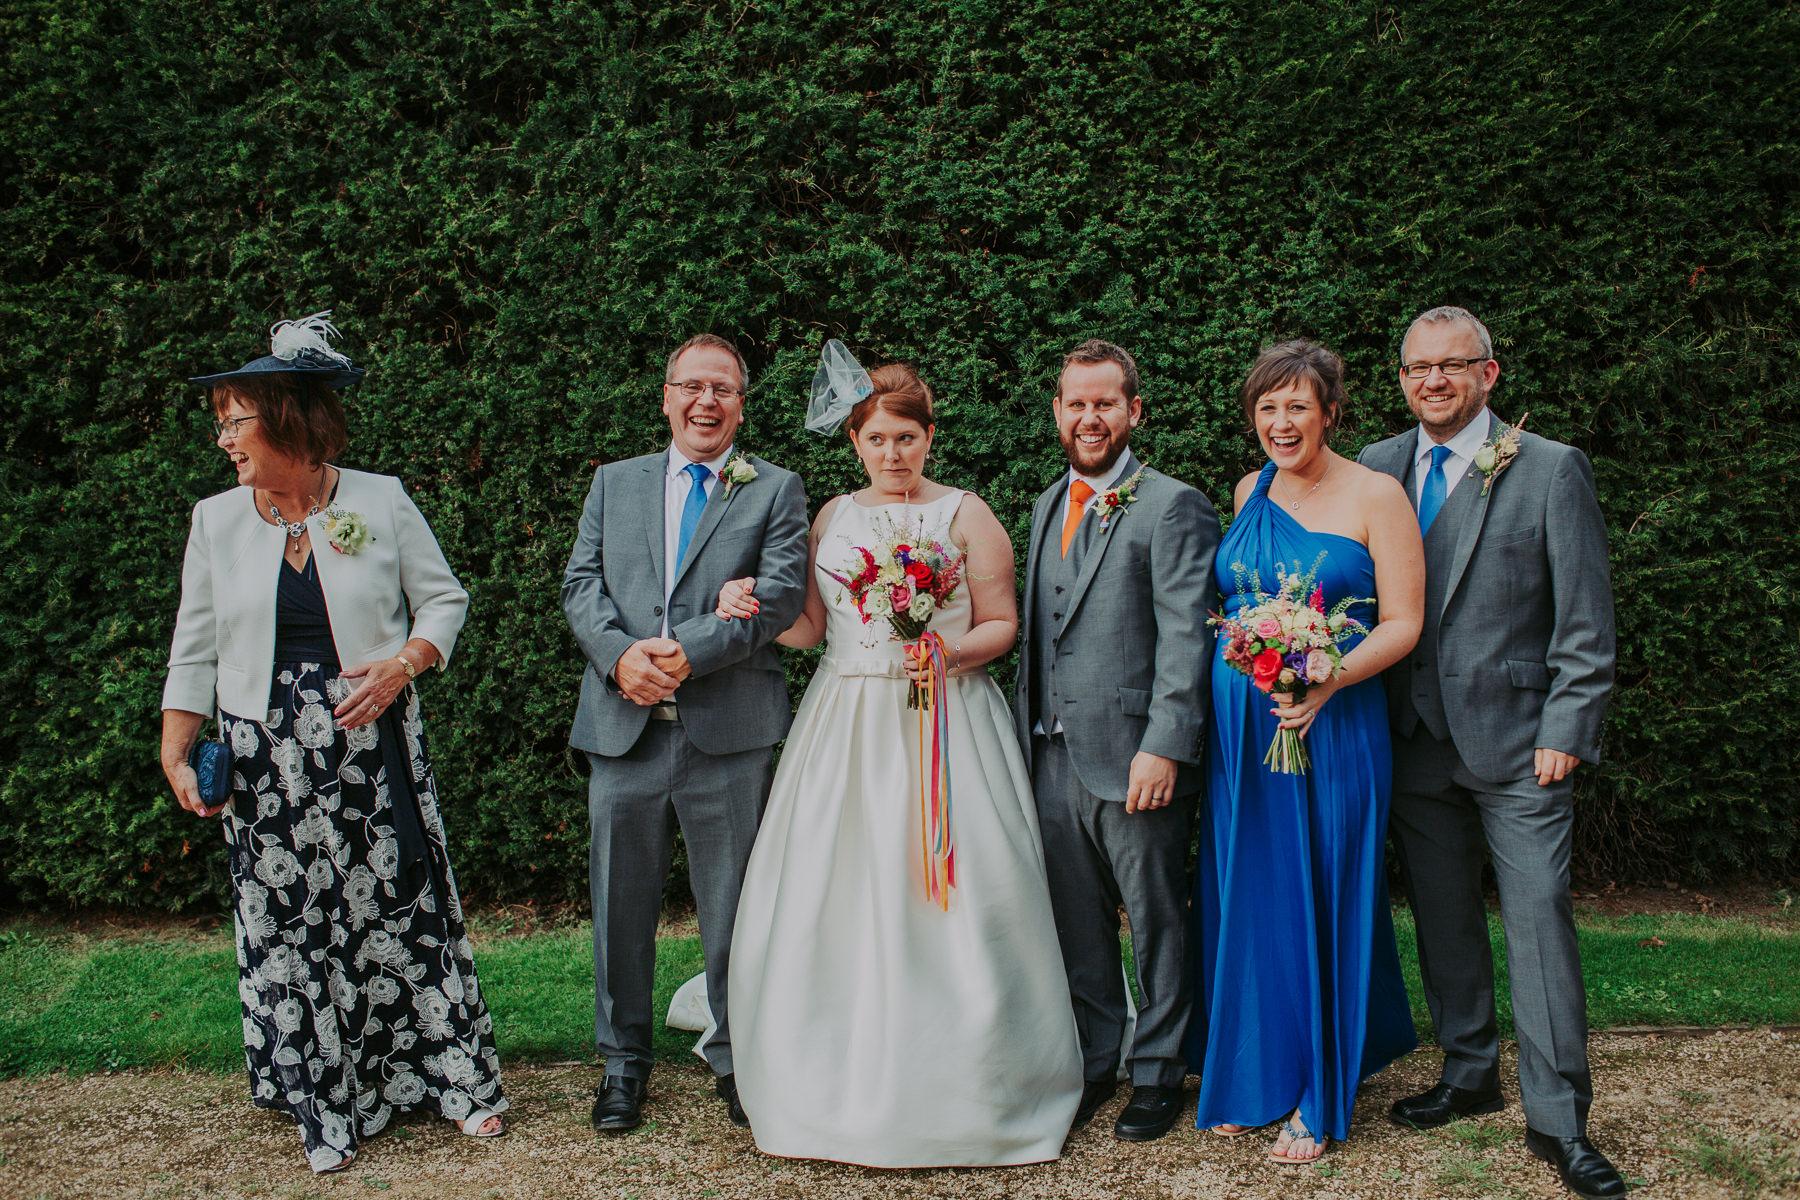 Yorkshire Sculpture Park Wedding